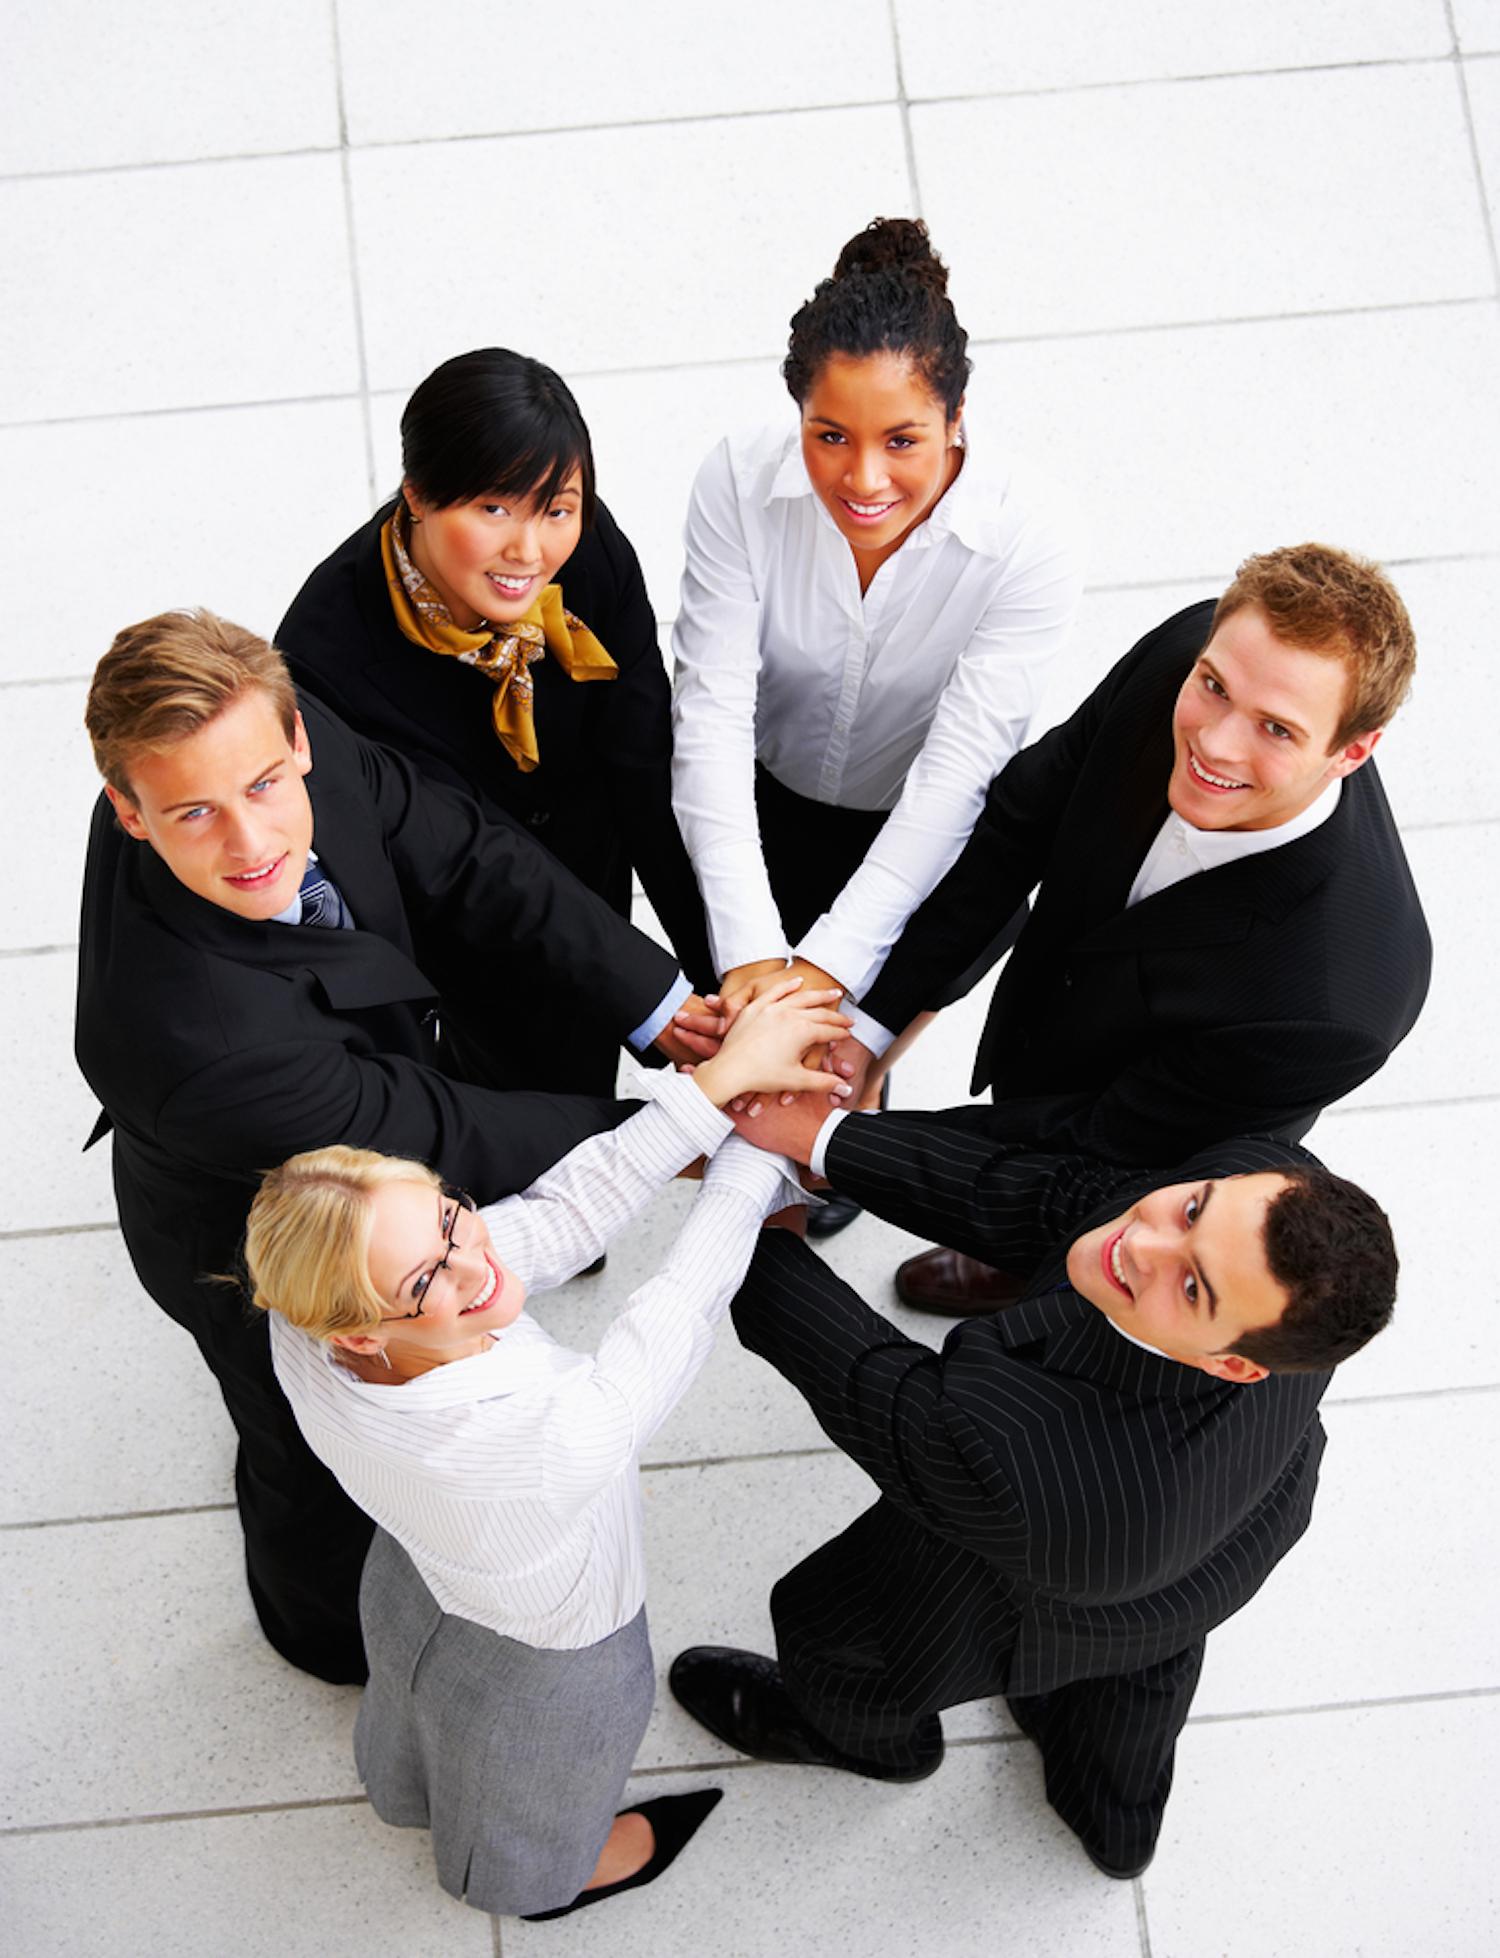 Develop A High Reliability Organization